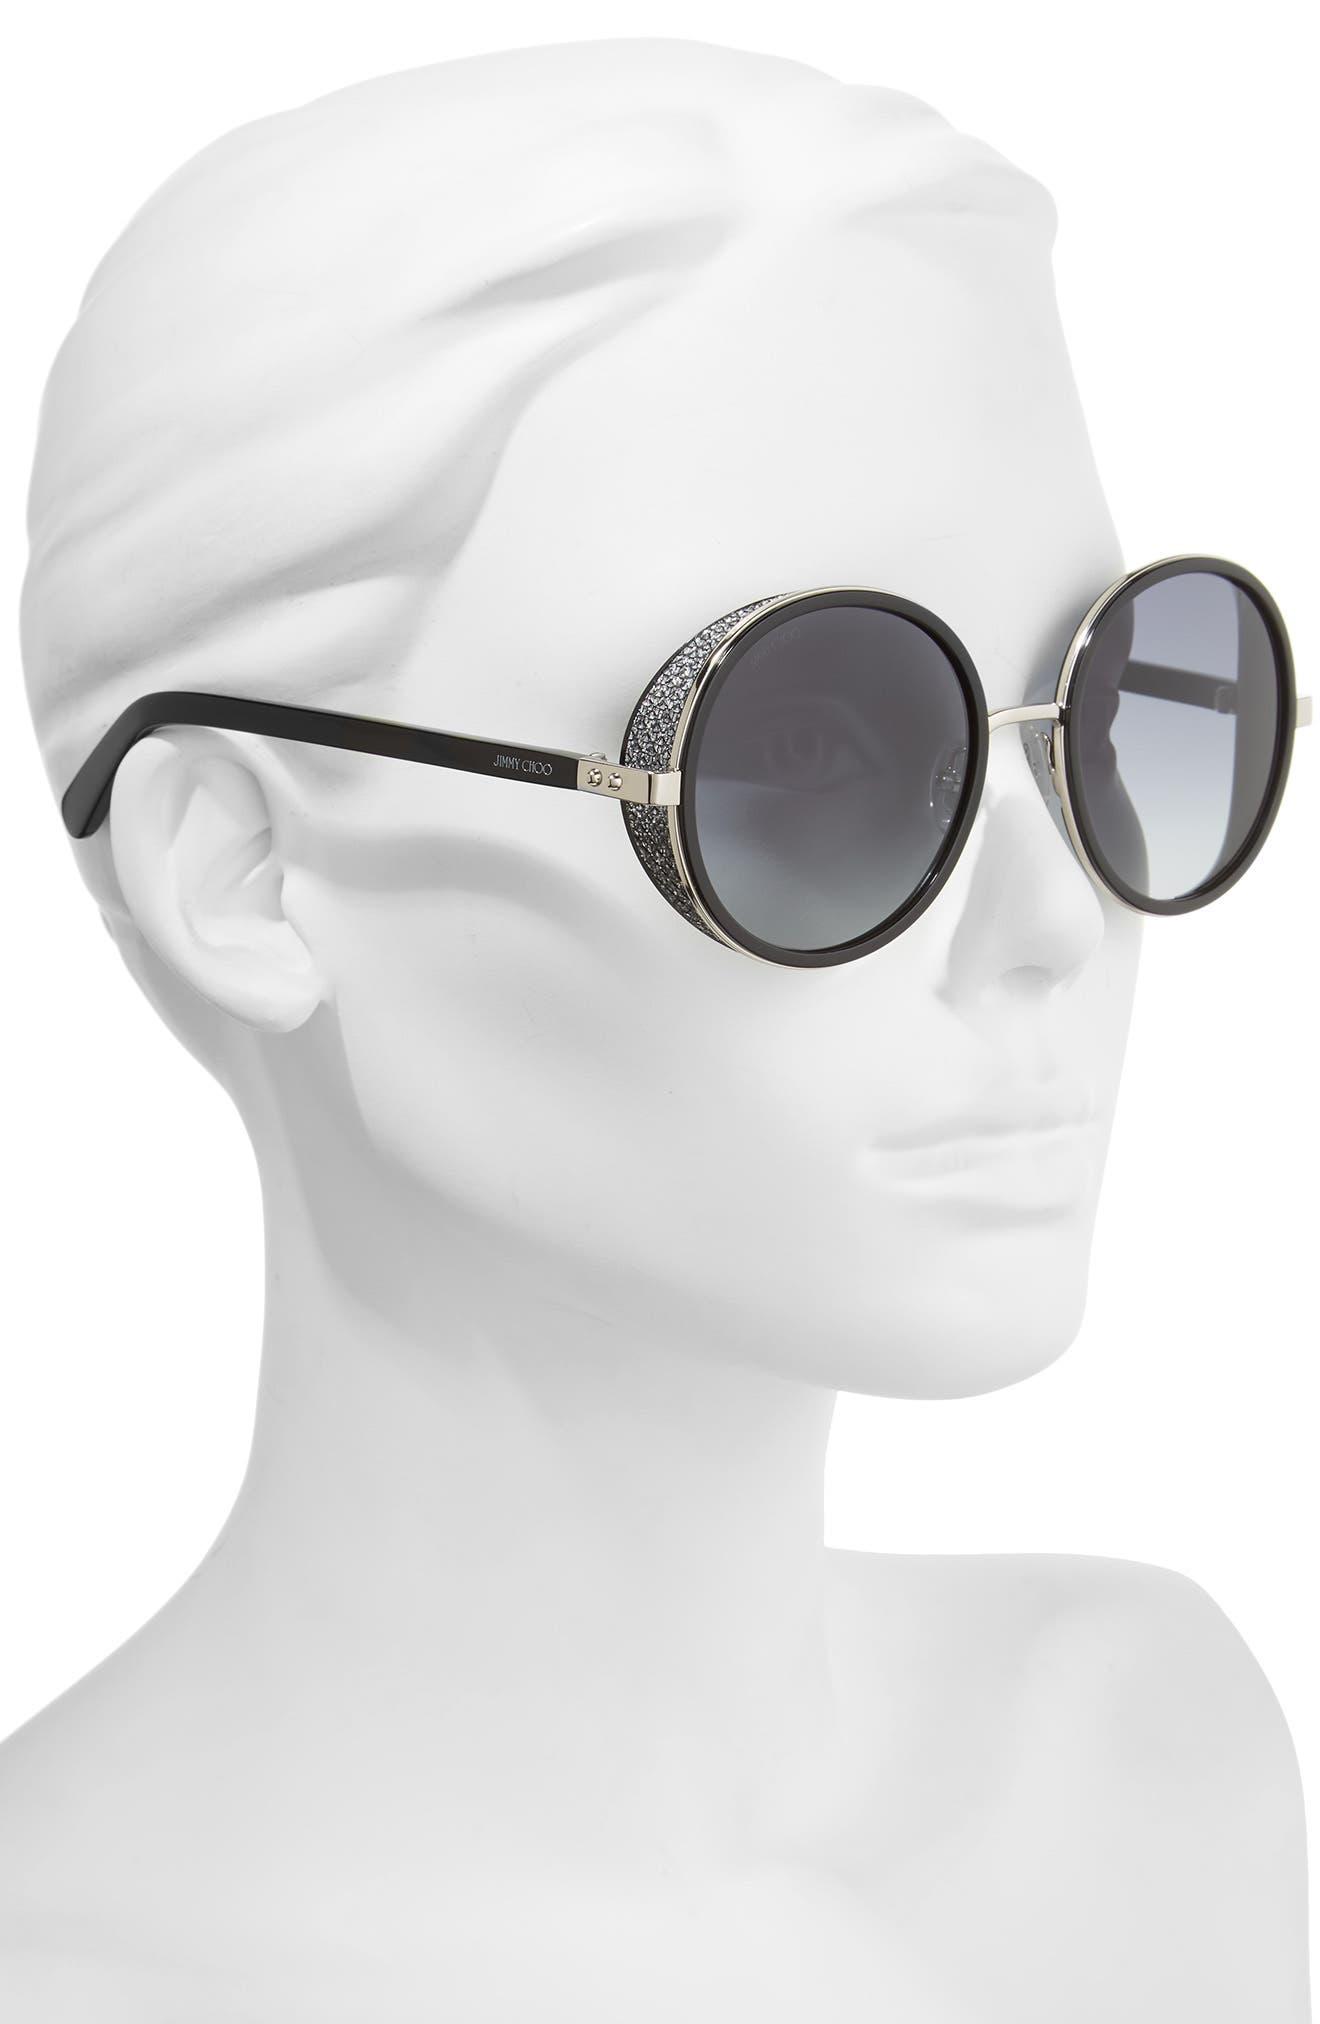 Andiens 54mm Round Sunglasses,                             Alternate thumbnail 2, color,                             Palladium/ Black